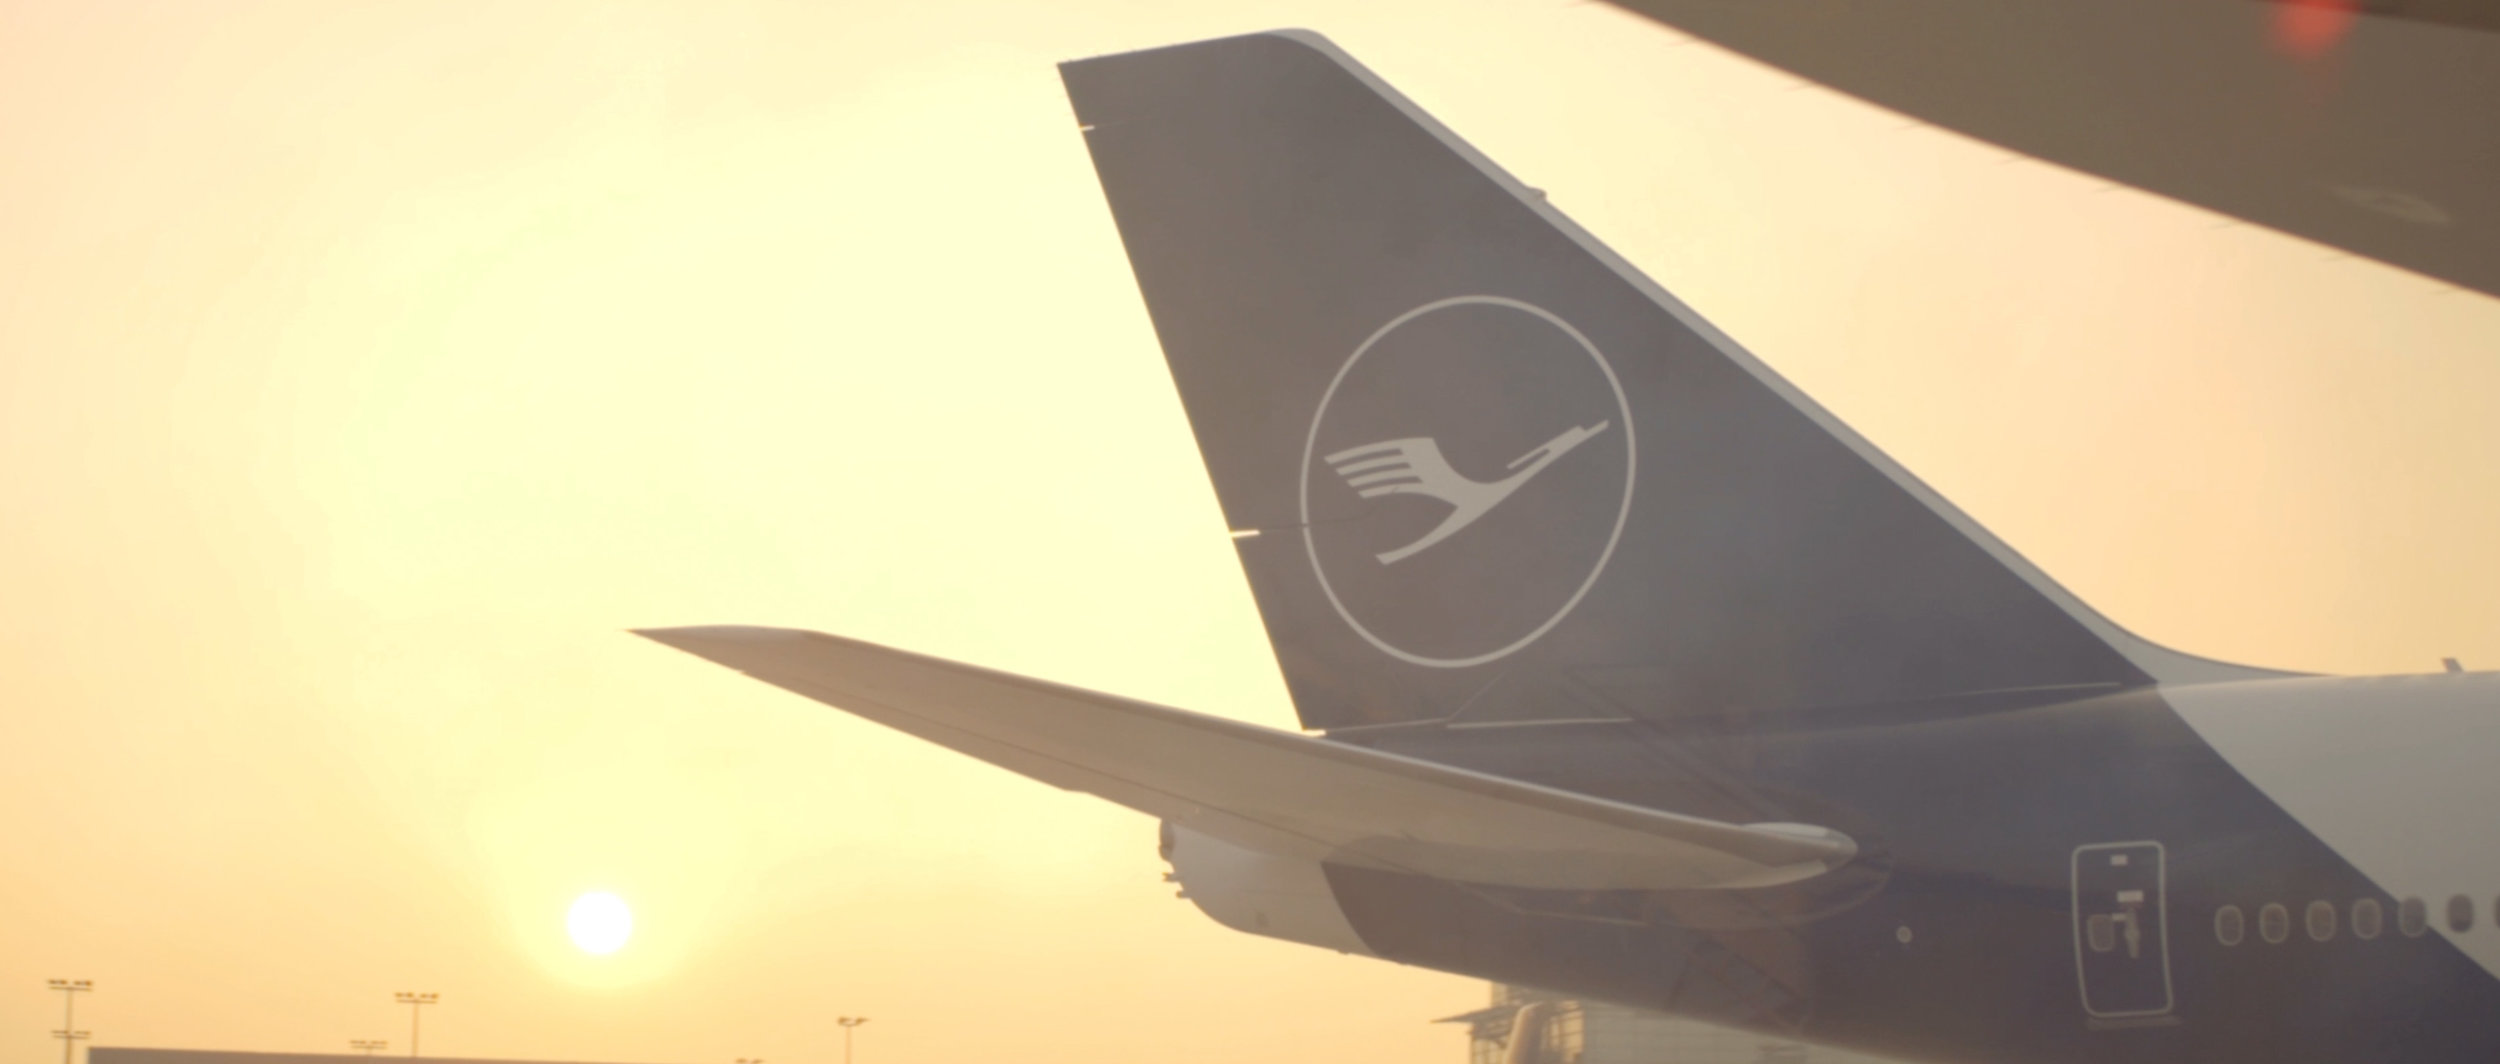 Lufthansa-Airplane-New-Airport-Surface-Beklebung-Travel-TakeOff_13.jpg